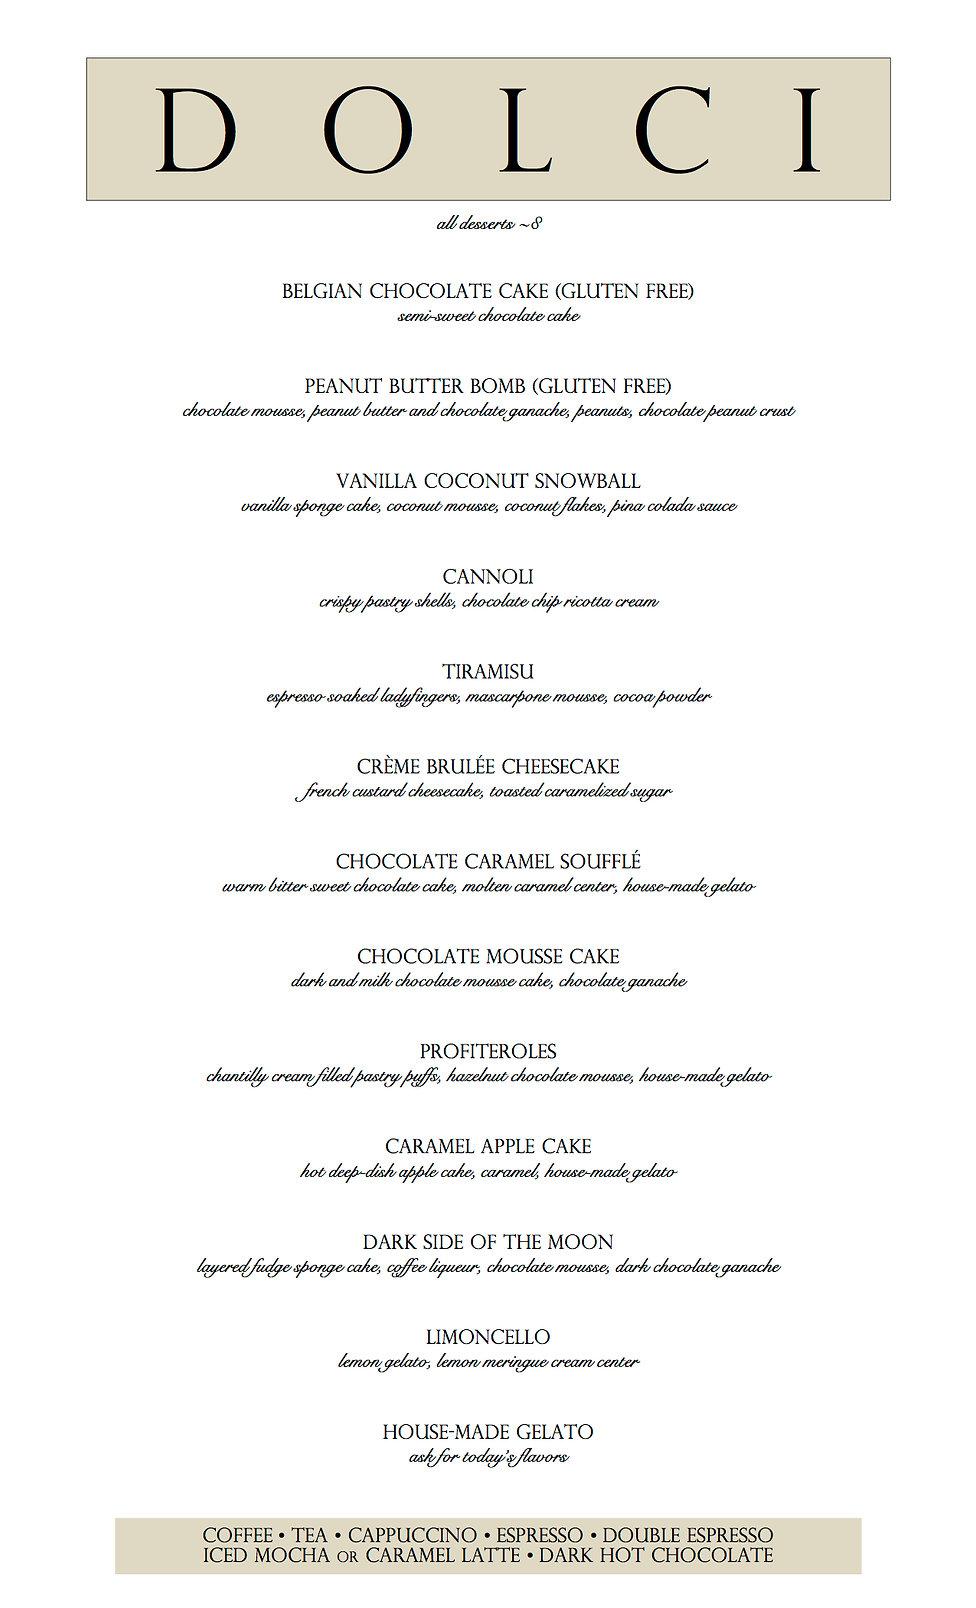 New Dessert Menu 2018 (JPEG) copy.jpg